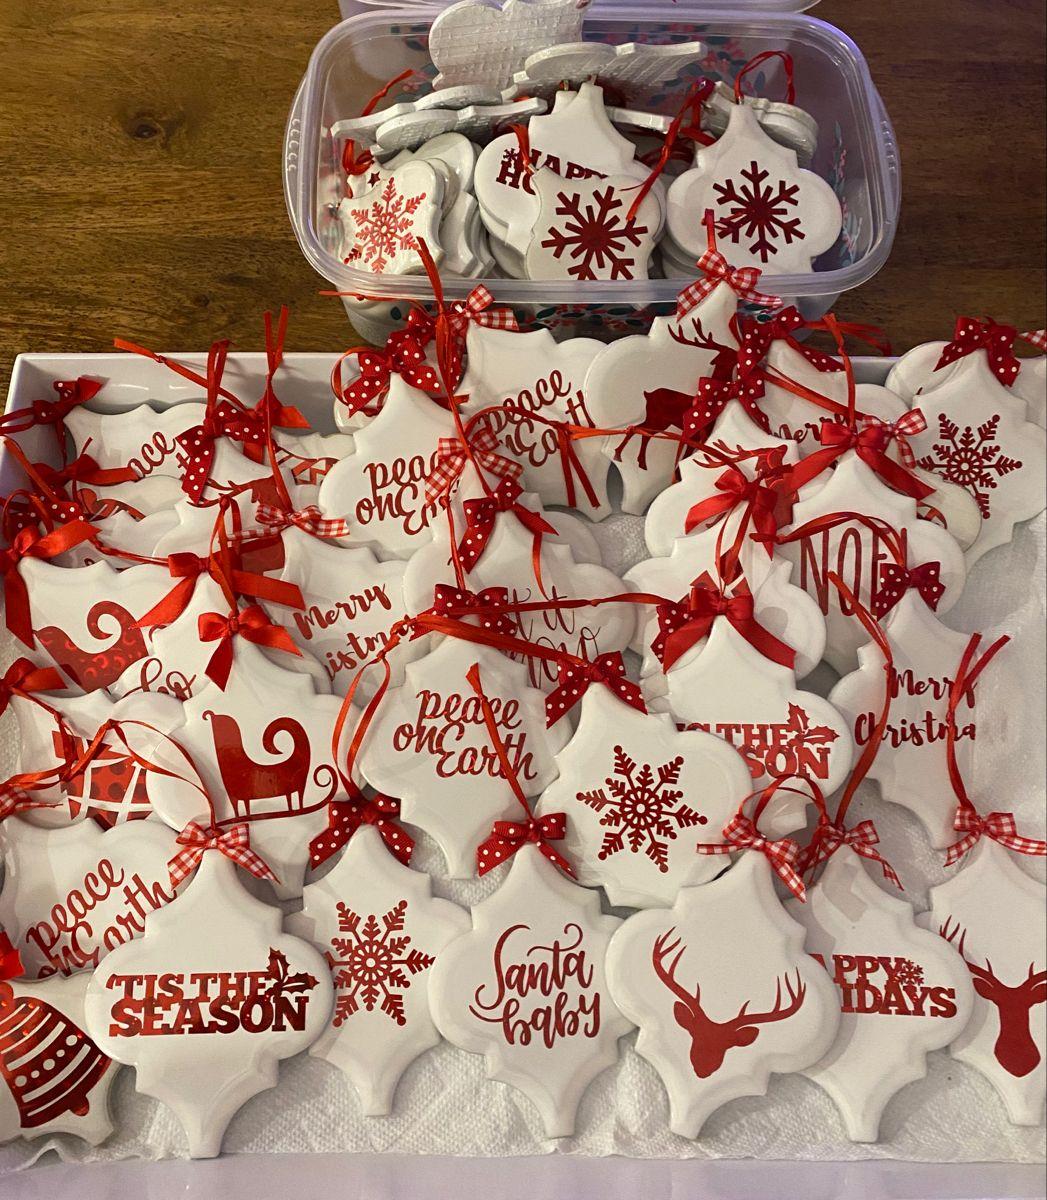 Tile Christmas Ornaments Christmas Ornaments Homemade Cricut Christmas Ideas Vinyl Christmas Ornaments